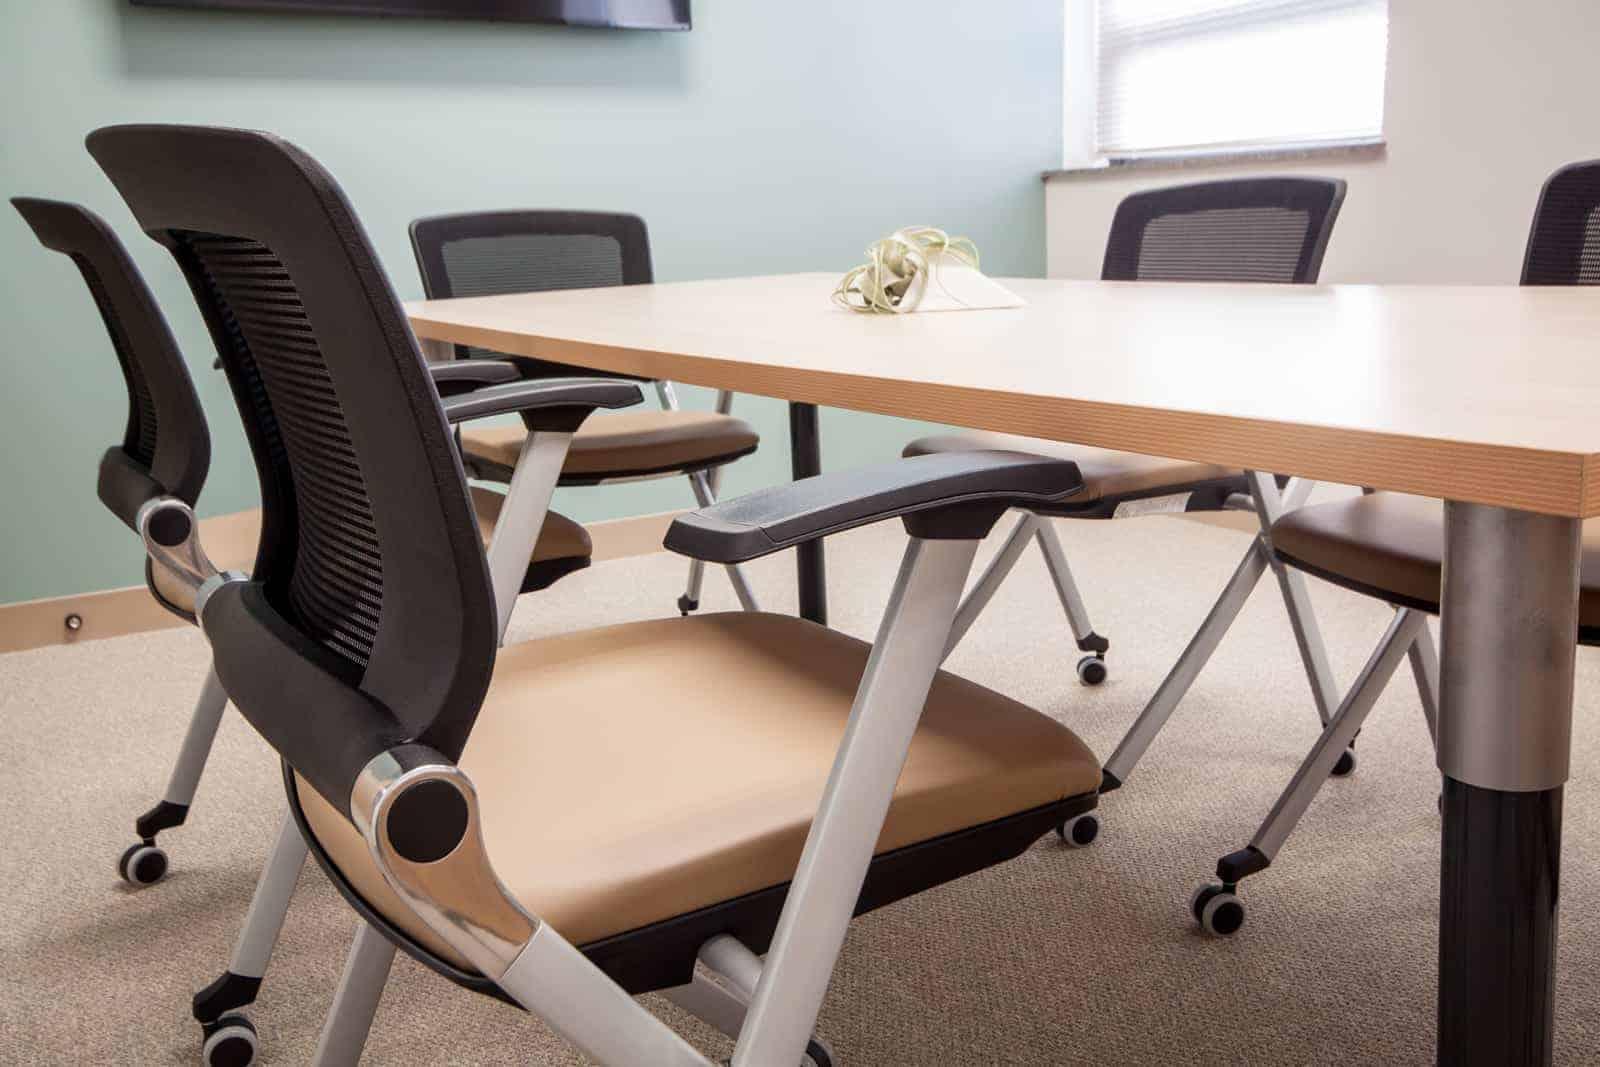 Design Furniture Malden Ma Kitchen Tables Chairs China